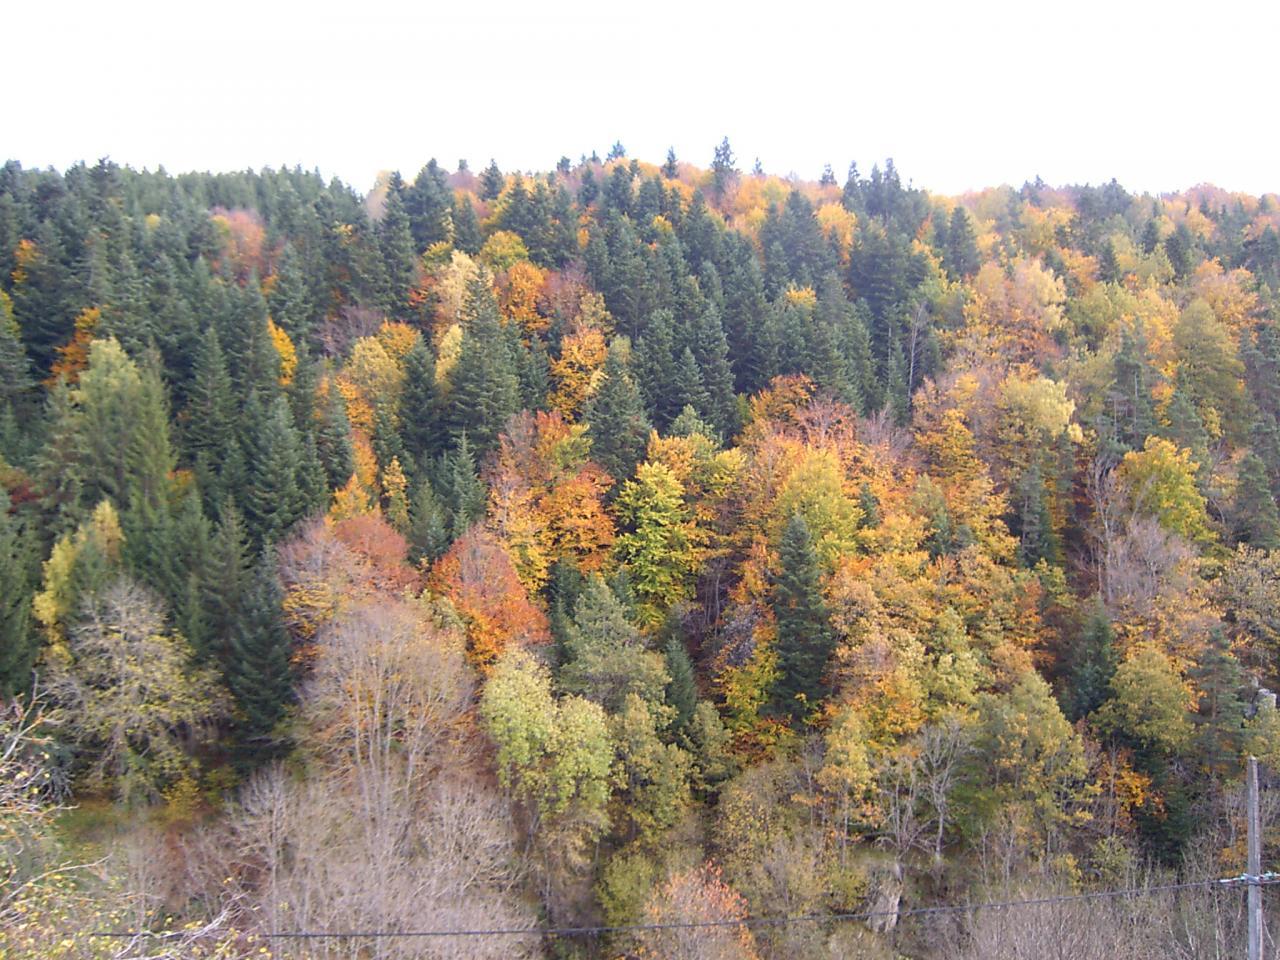 Automne vallee de l'Allier